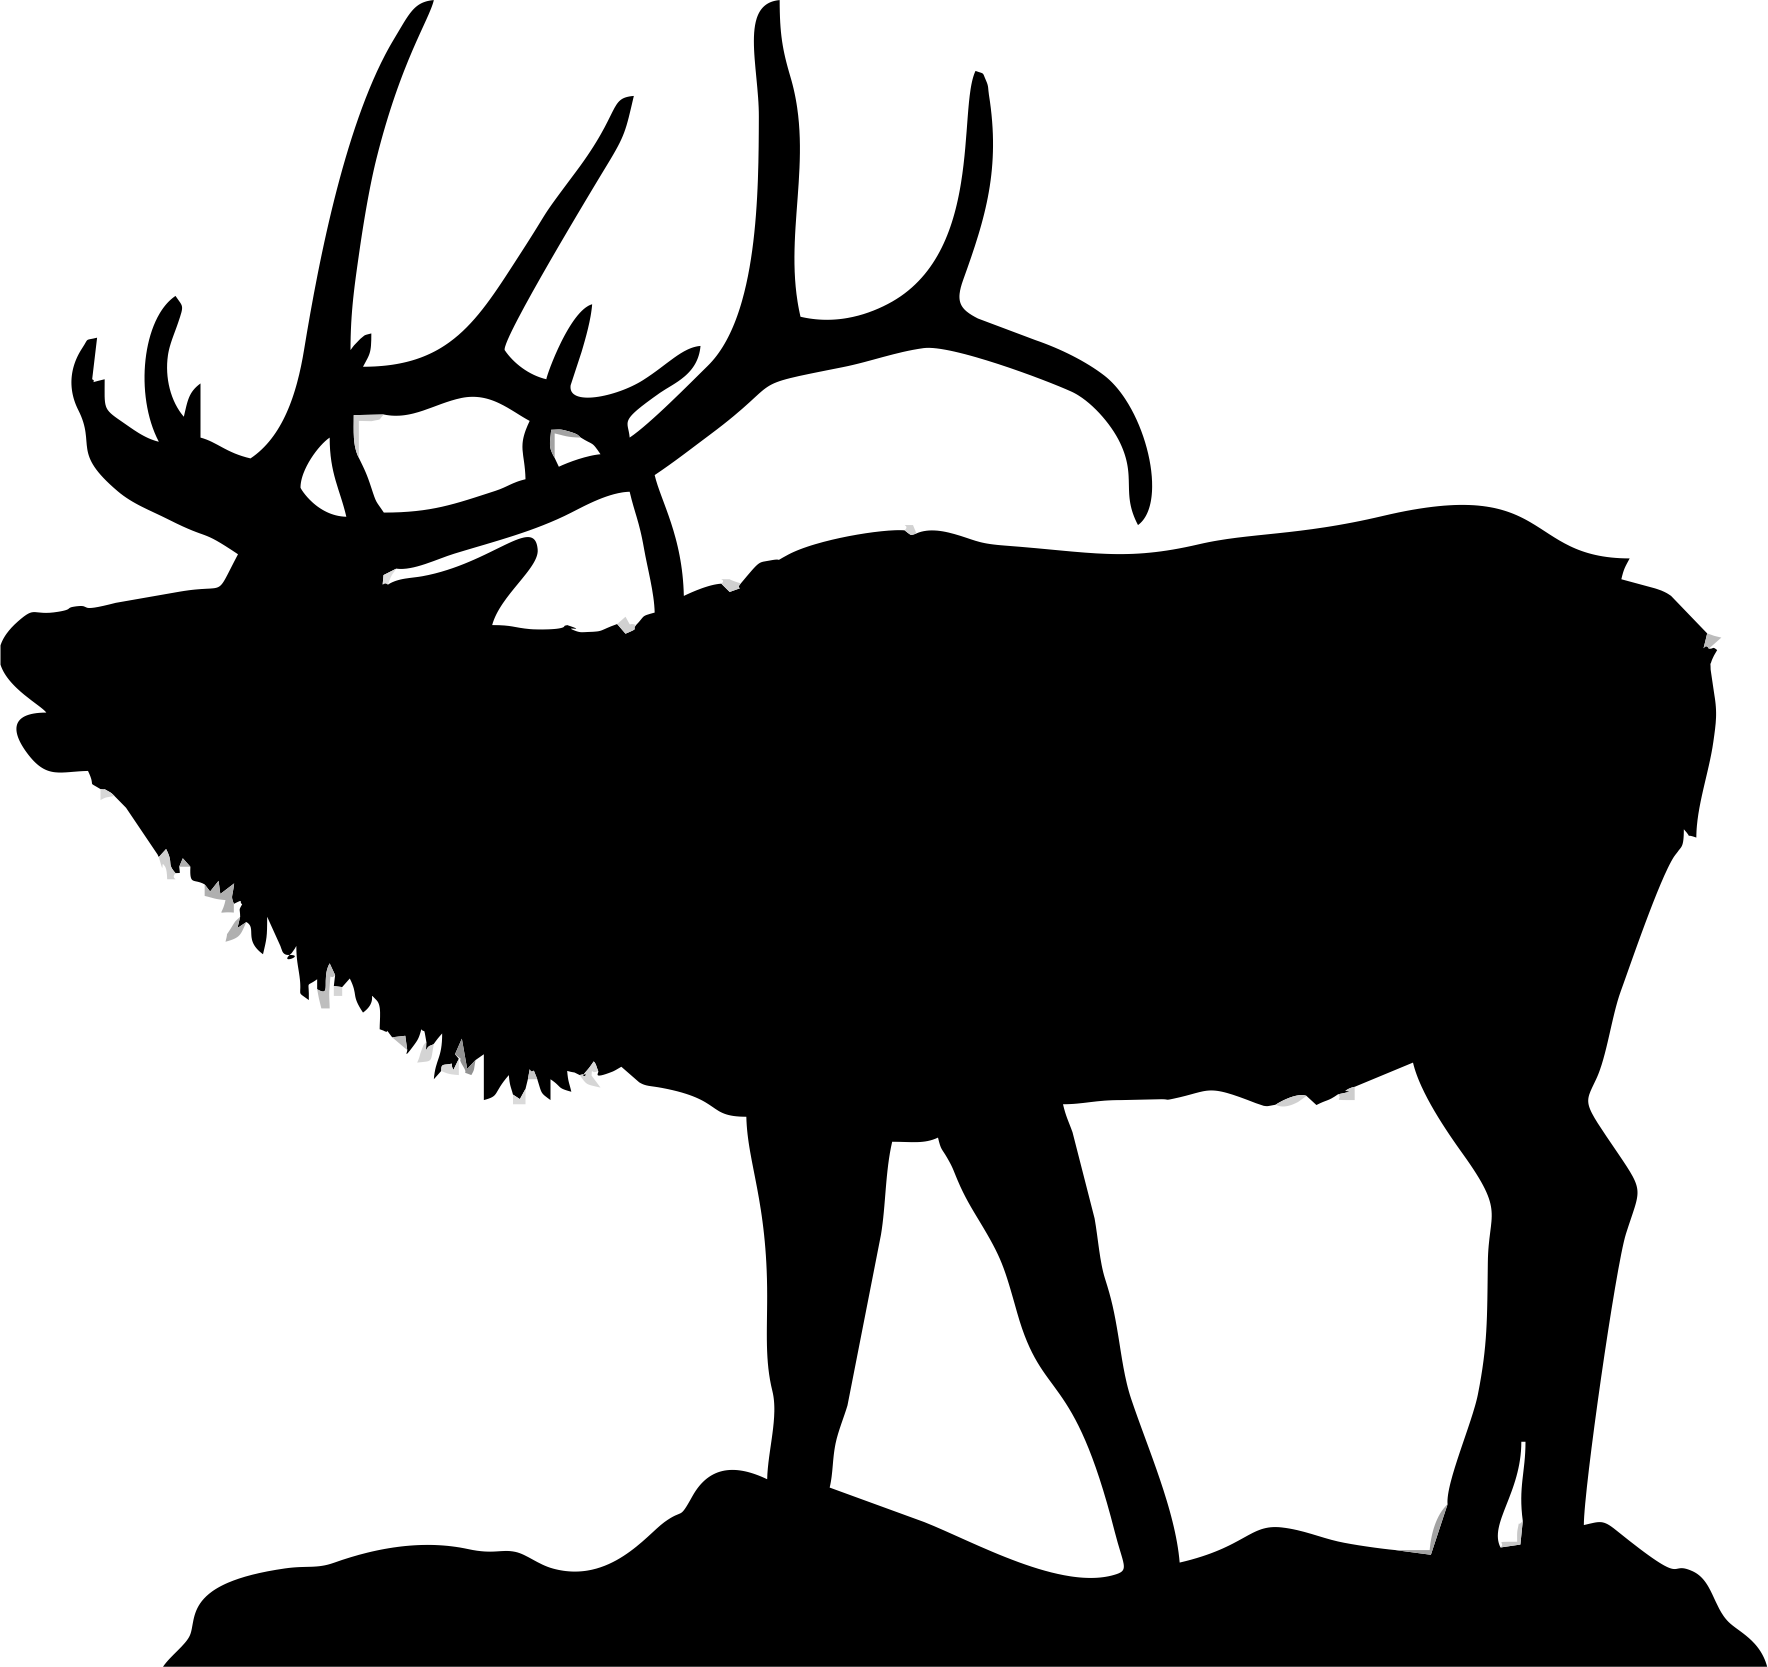 elk silhouette clip art at getdrawings com free for personal use rh getdrawings com elk clip artist for free elk clip art wildlife images